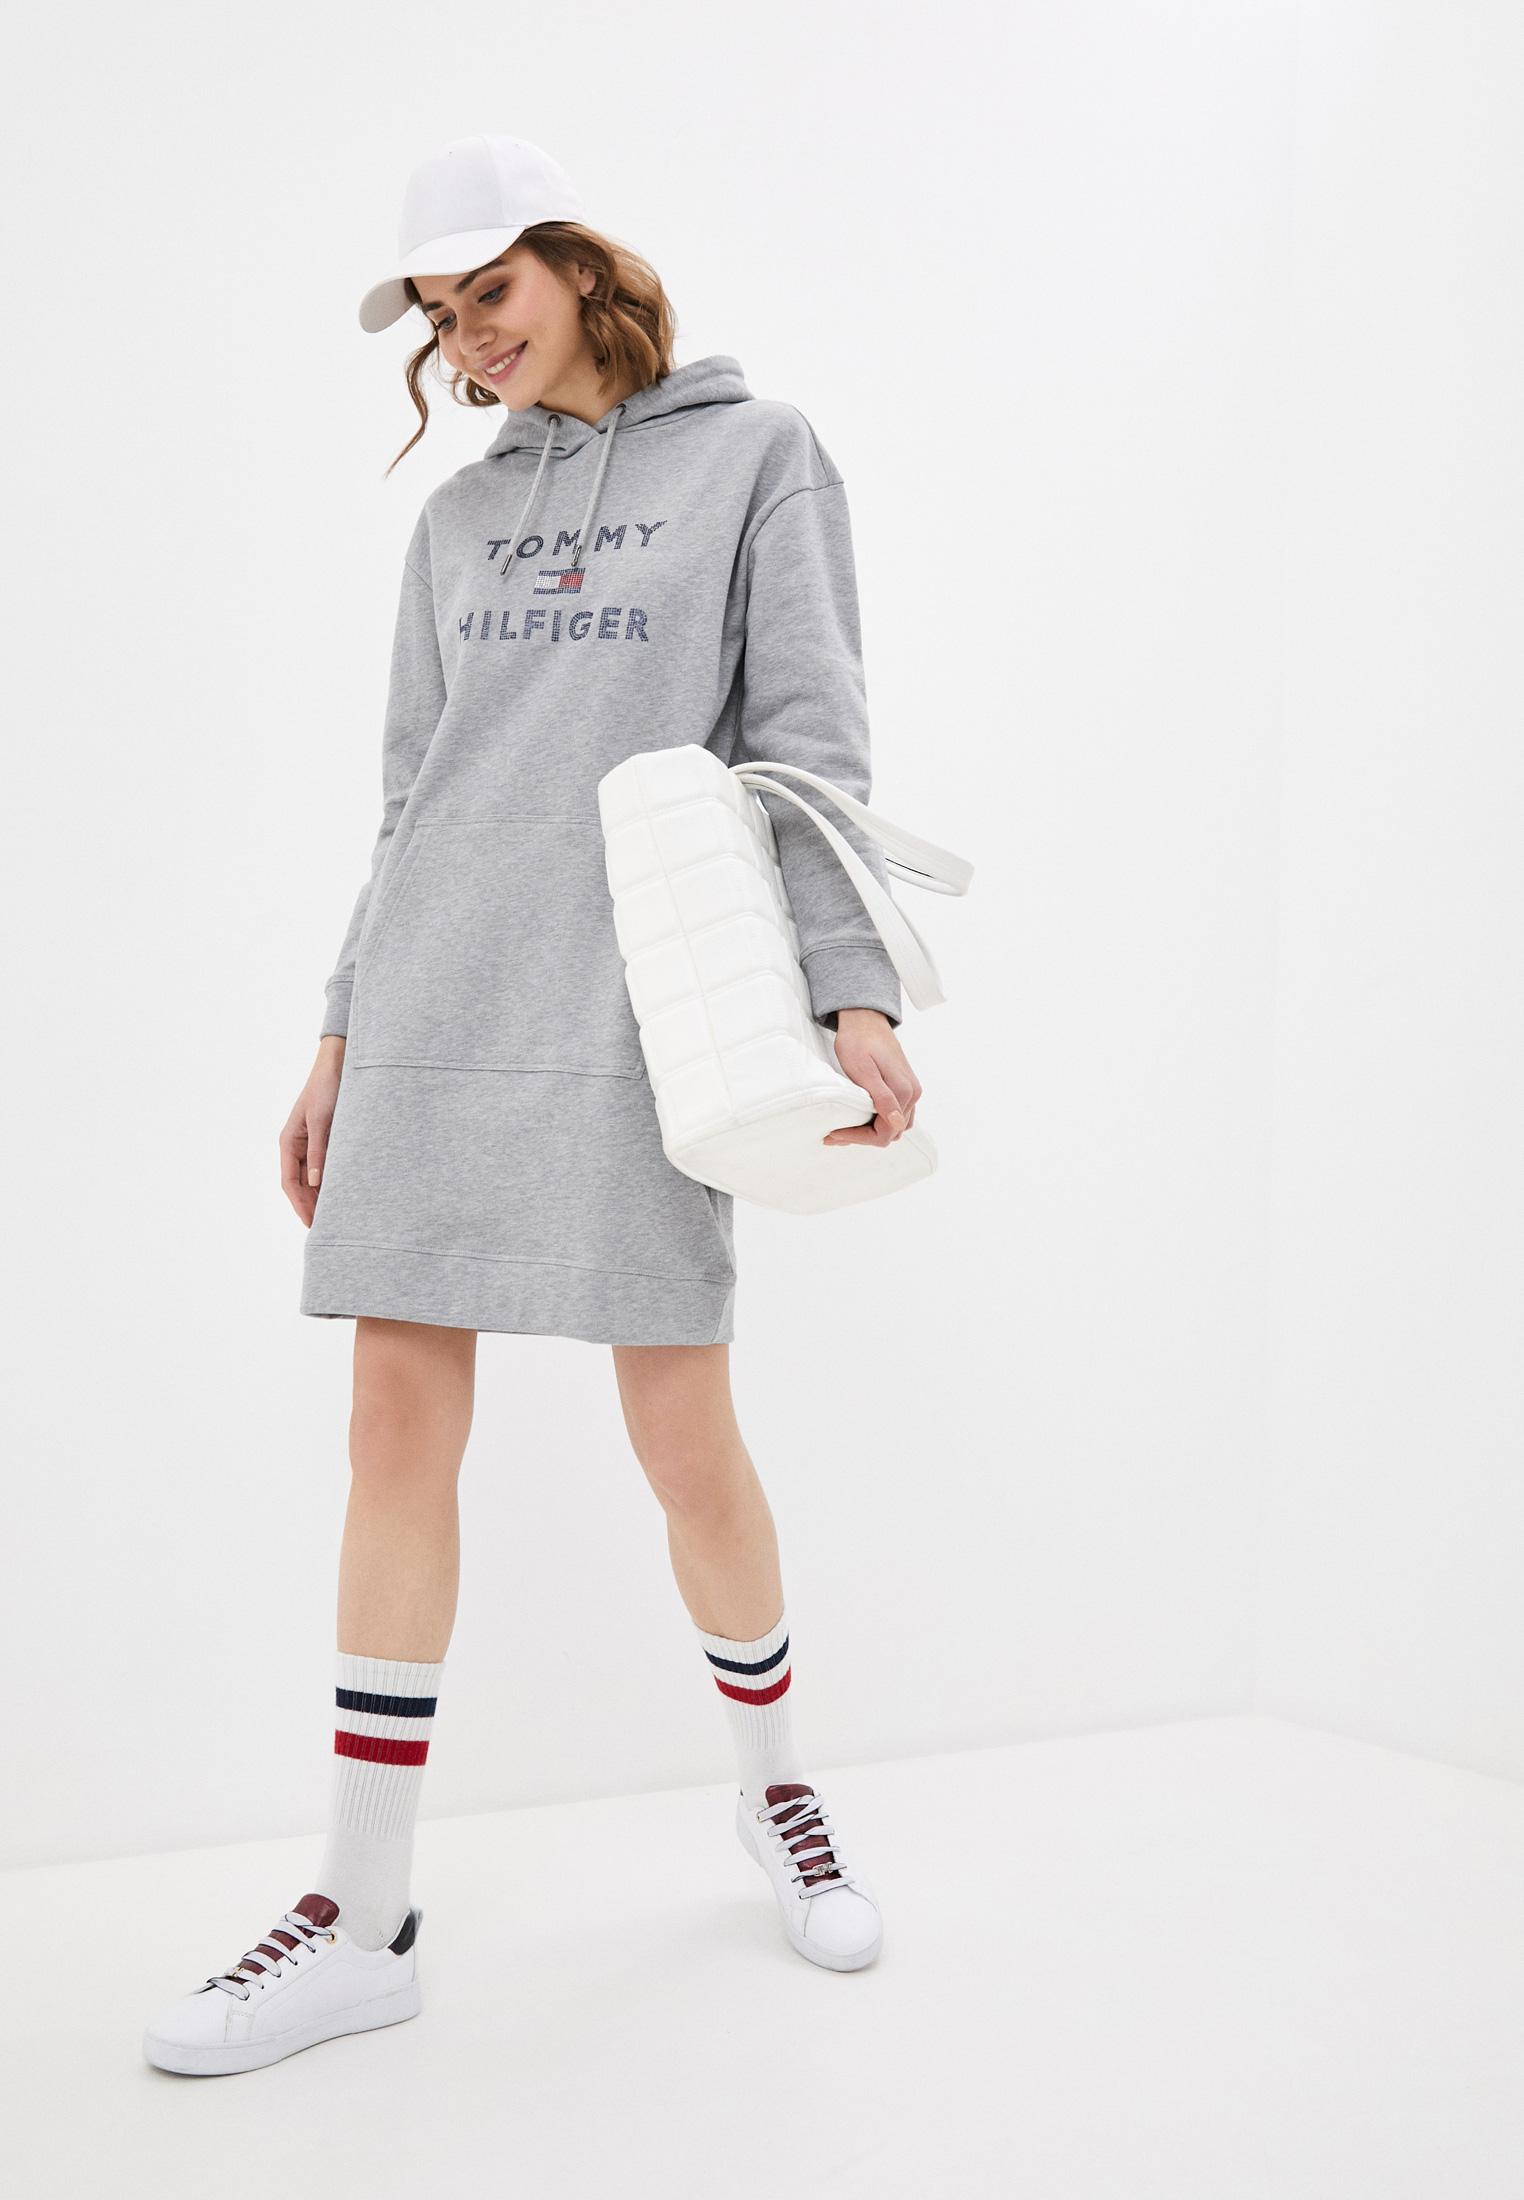 Платье Tommy Hilfiger (Томми Хилфигер) WW0WW31086: изображение 2